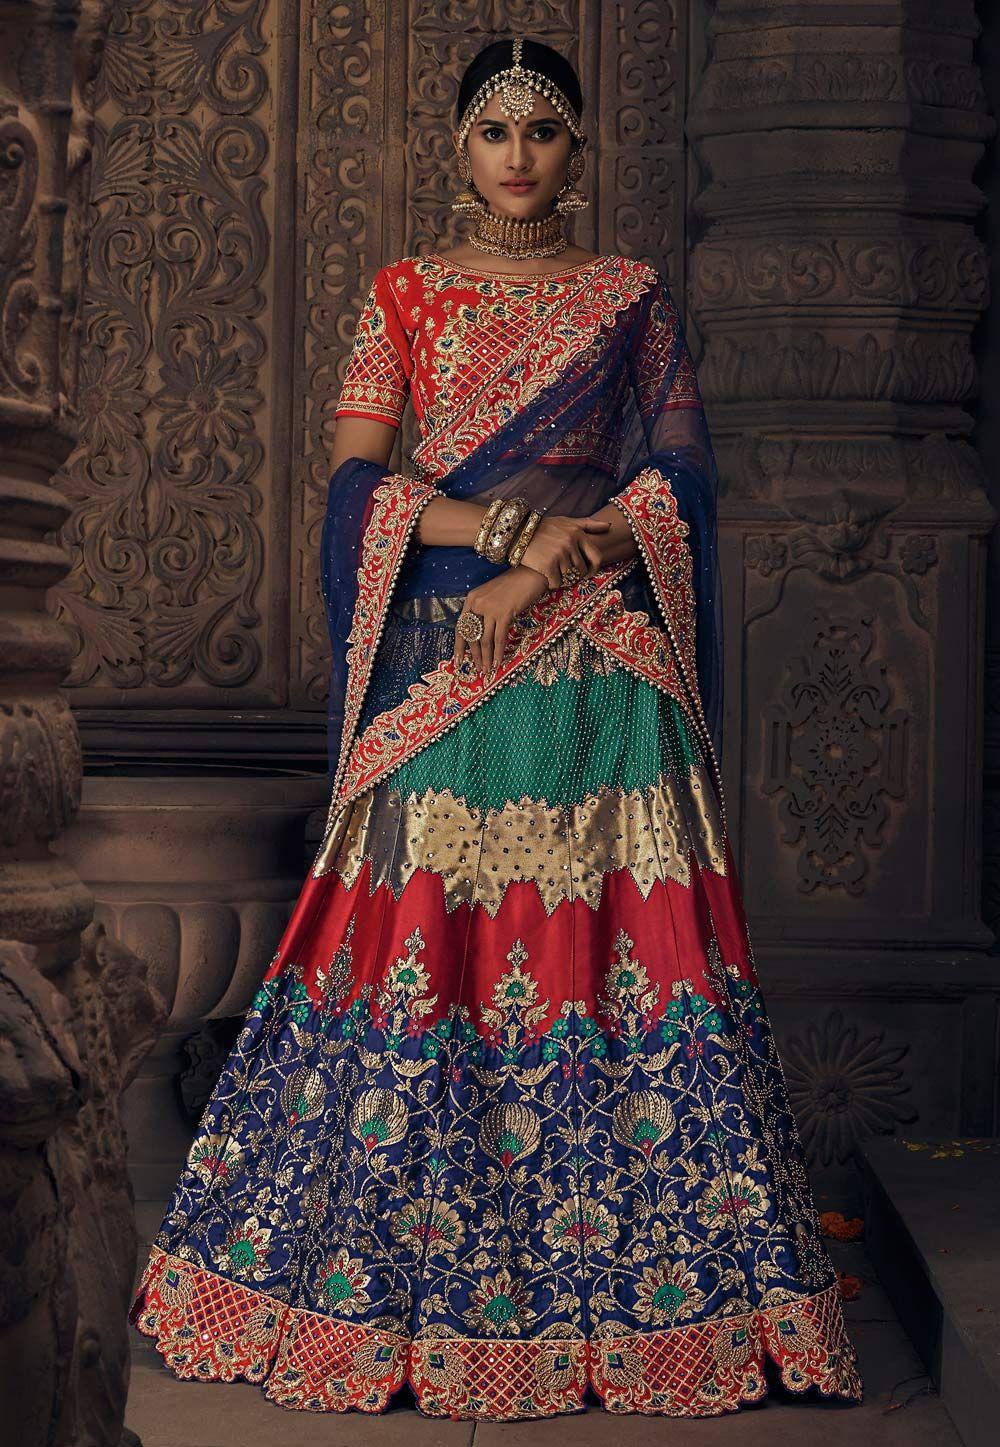 dd452198b06 Buy Navy Blue Banarasi Silk Circular Lehenga Choli 154989 online at best  price from vast collection of Lehenga Choli and Chaniya Choli at ...